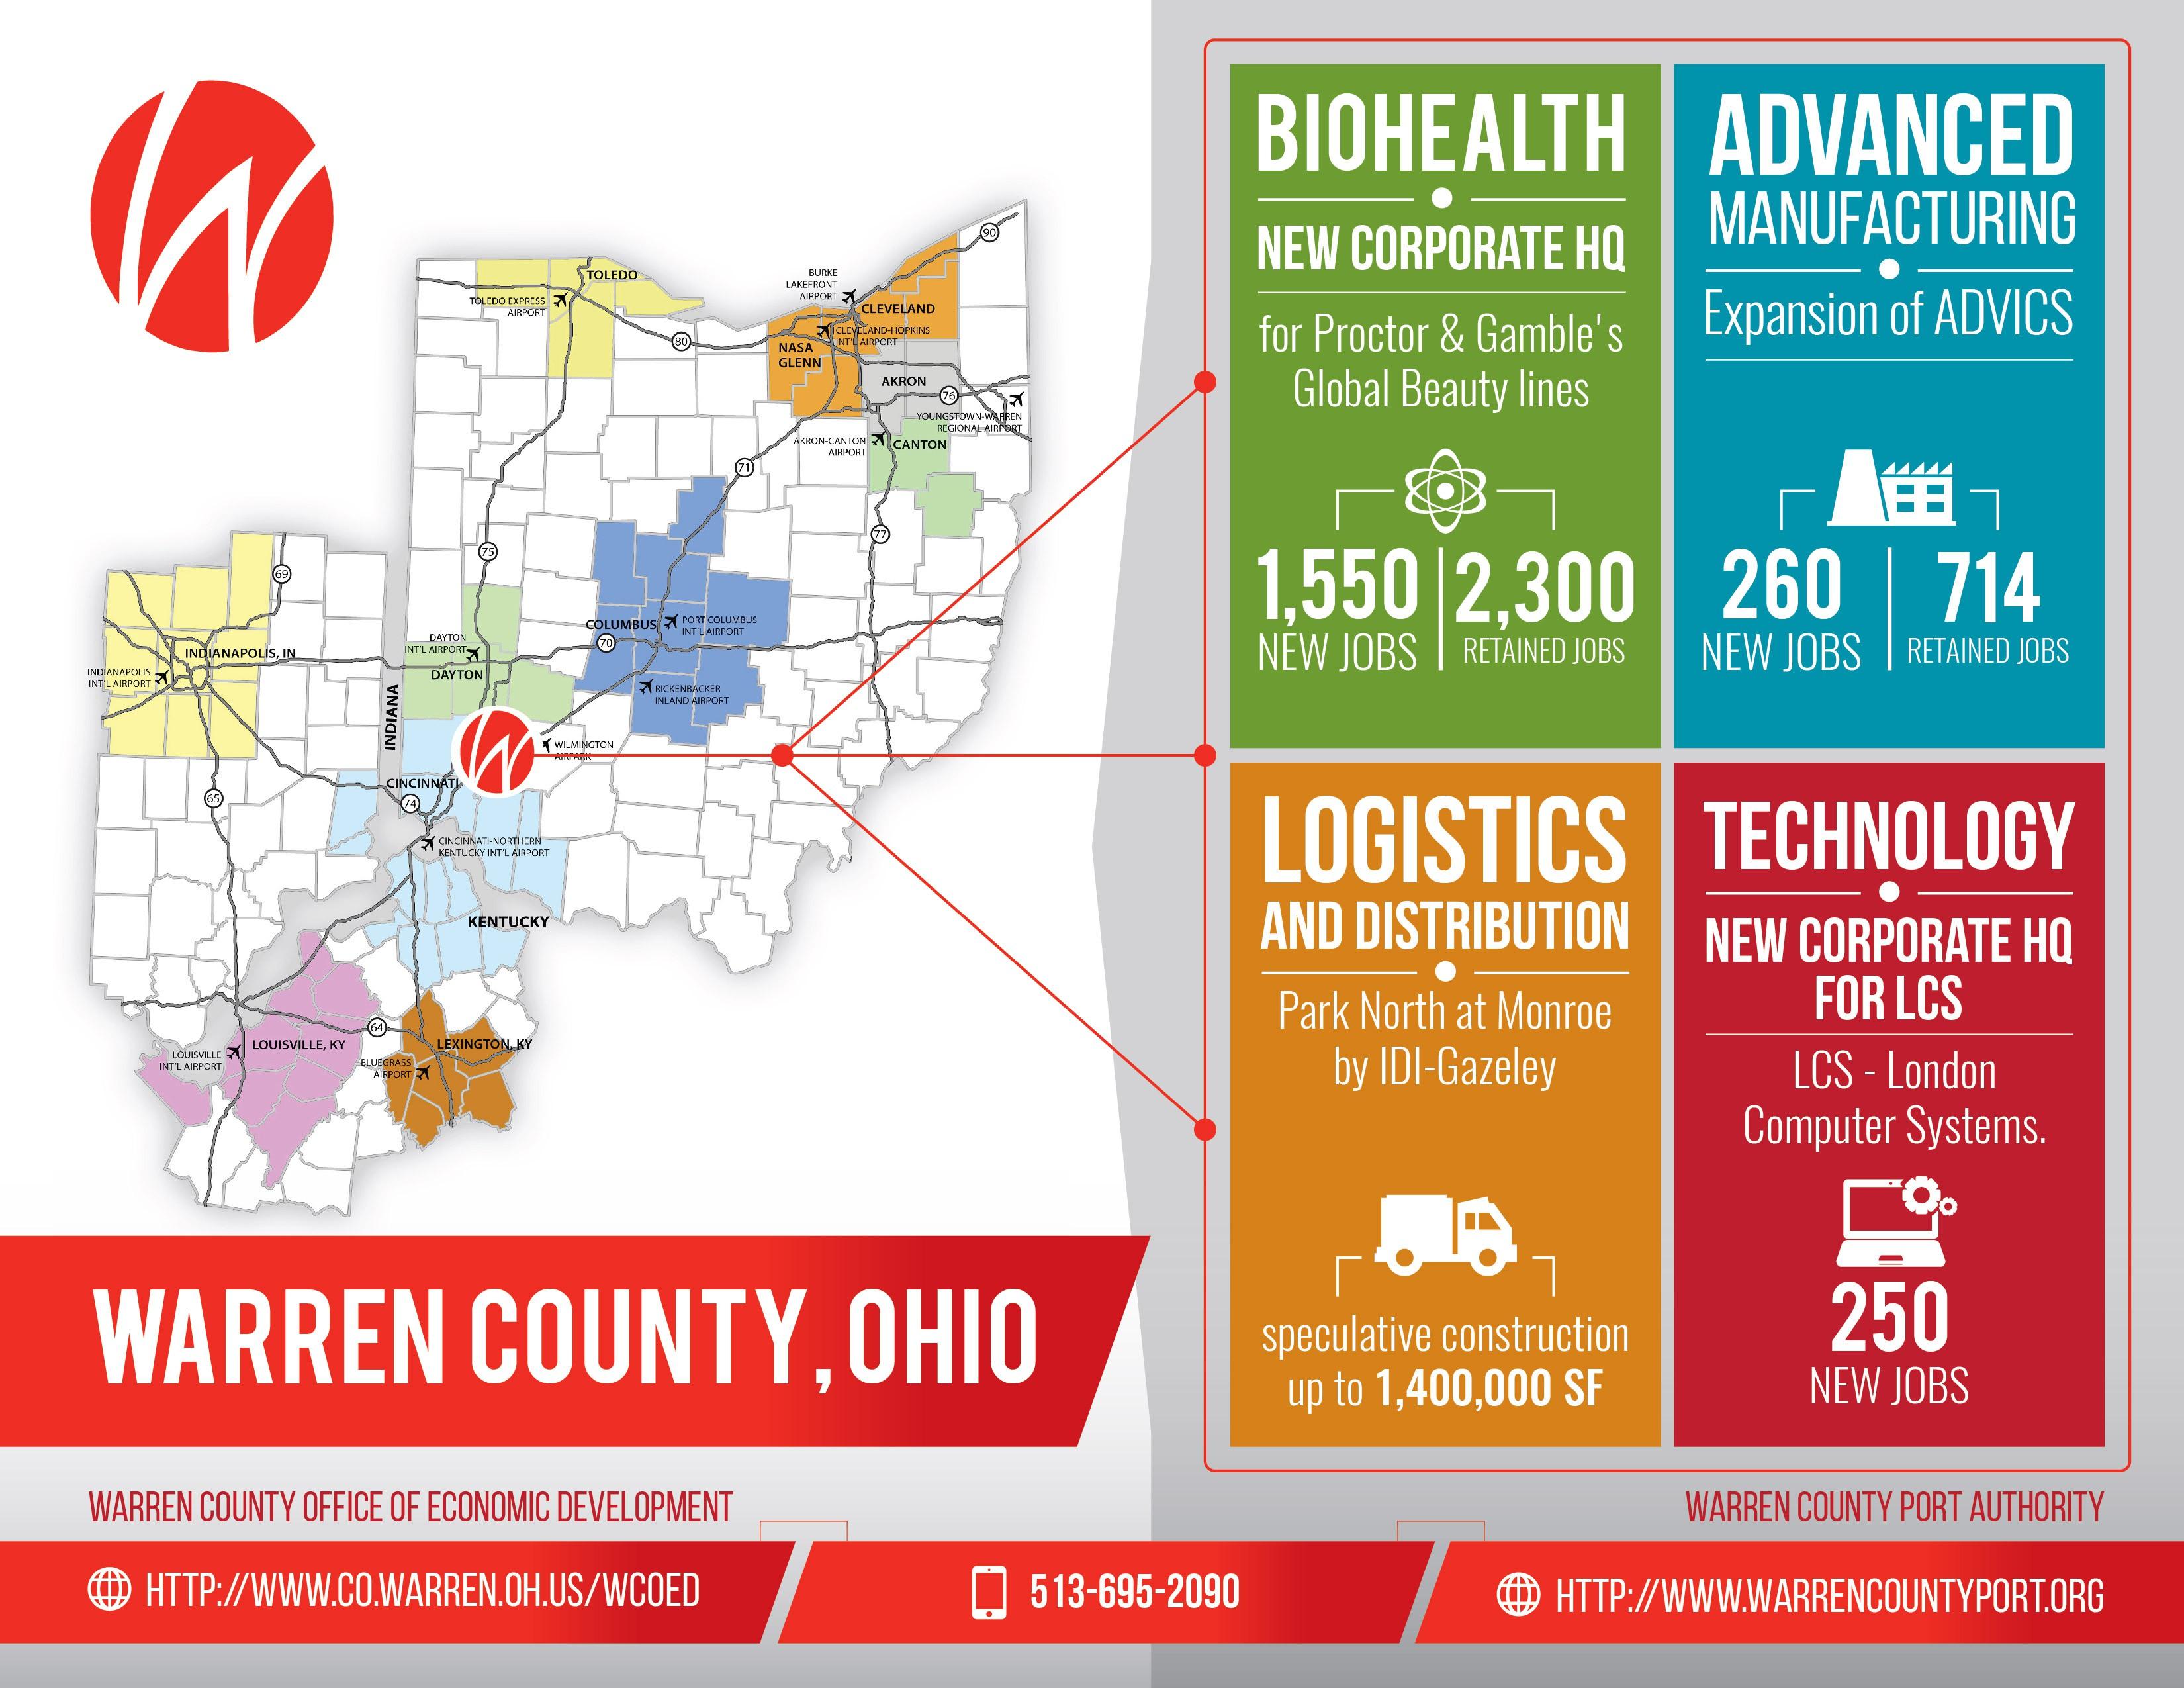 Economic Development Marketing Piece for a County in Ohio